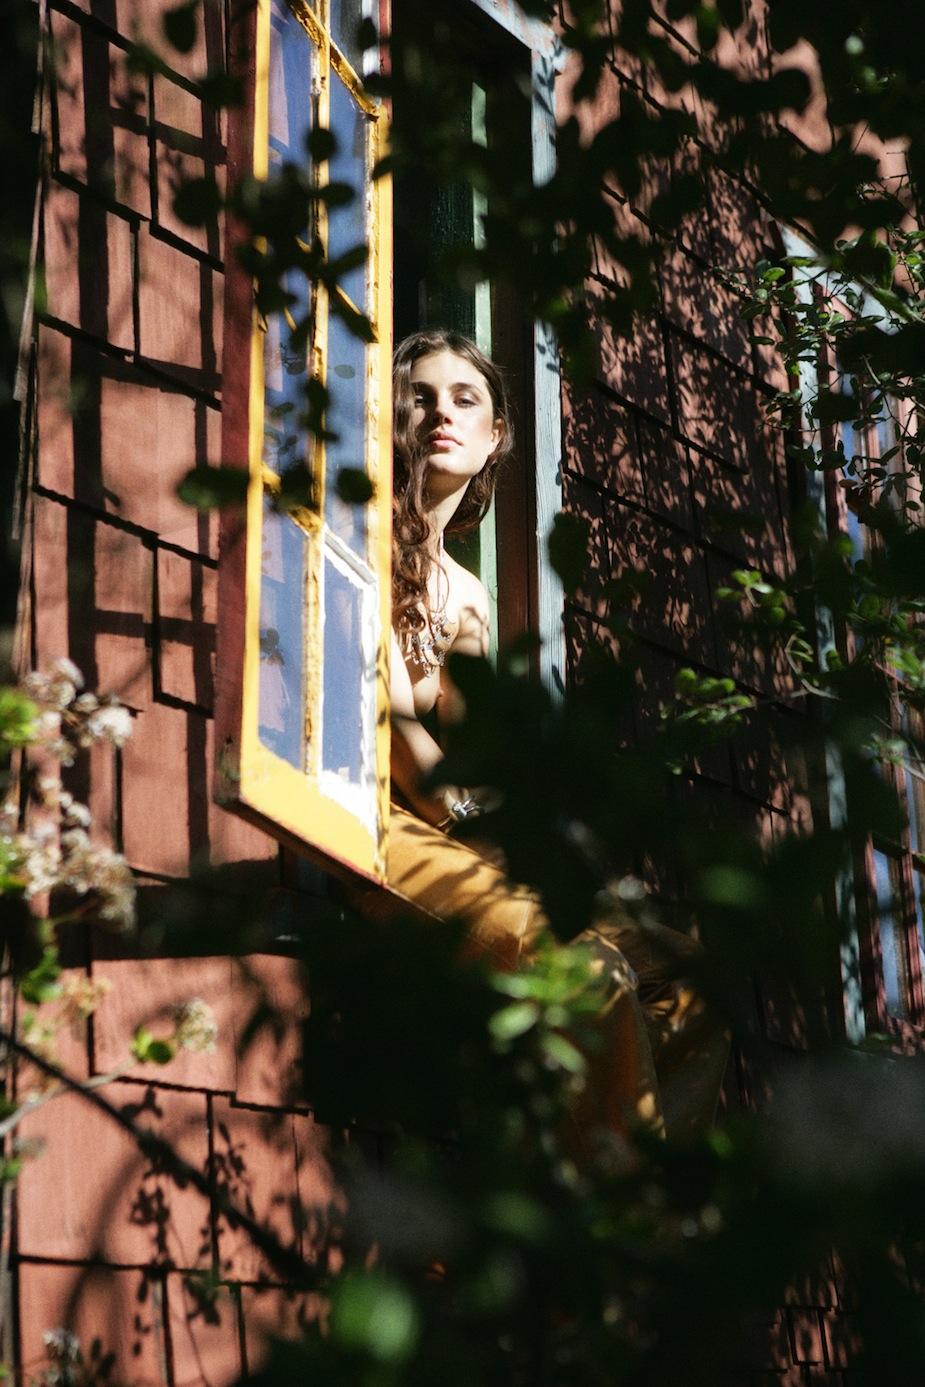 Anna Christine Speckhart by Jason Lee Parry (In Plain Sight - Trendi Finnish April 2012) 11.jpg